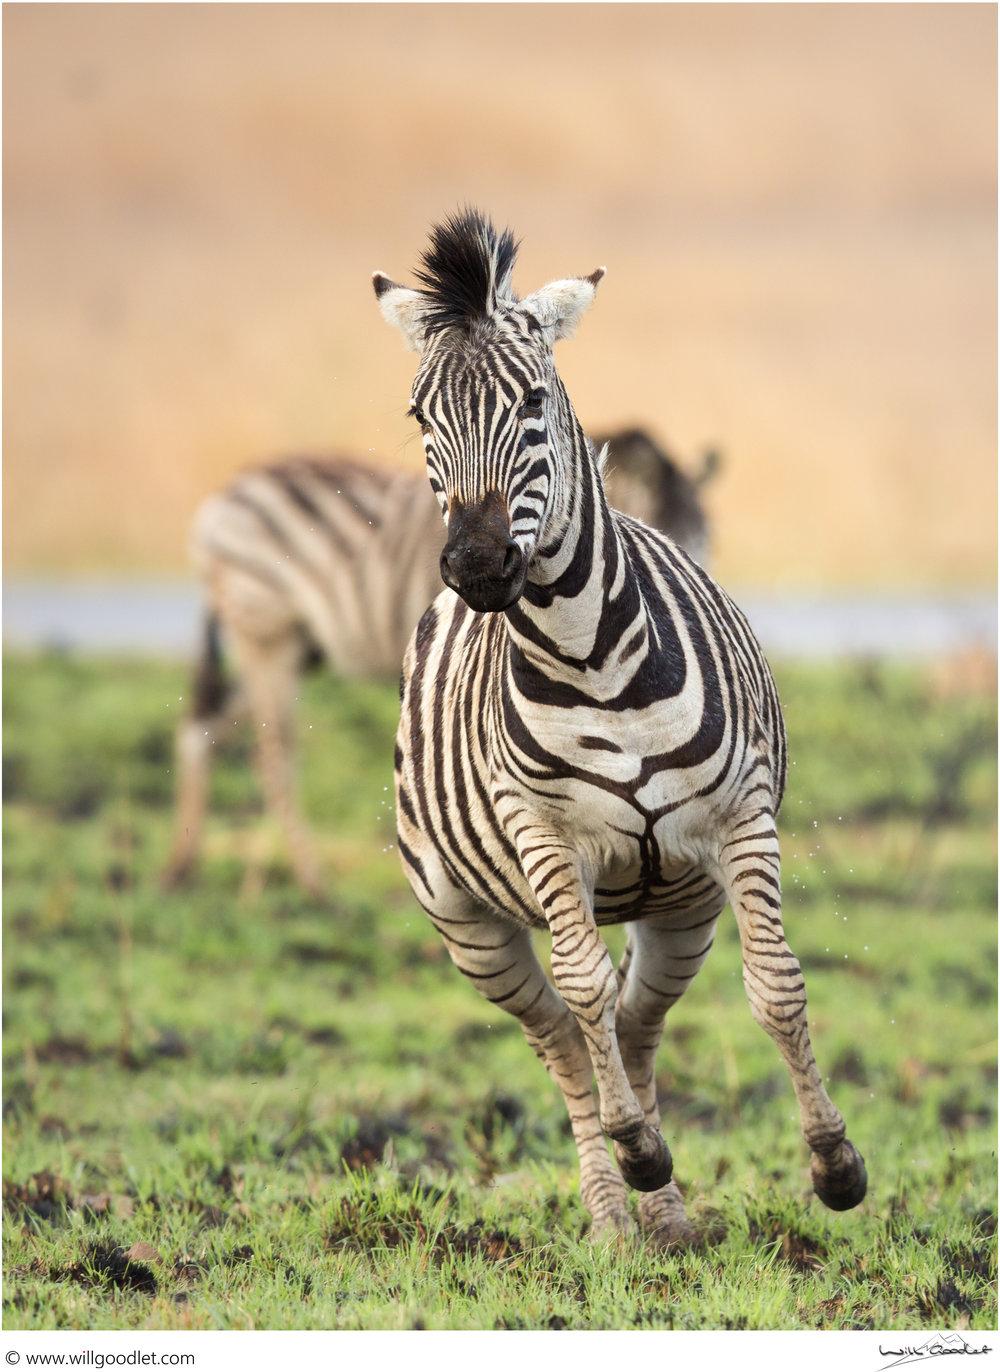 Zebra running off steam, Rietvlei Nature Reserve, South Africa.